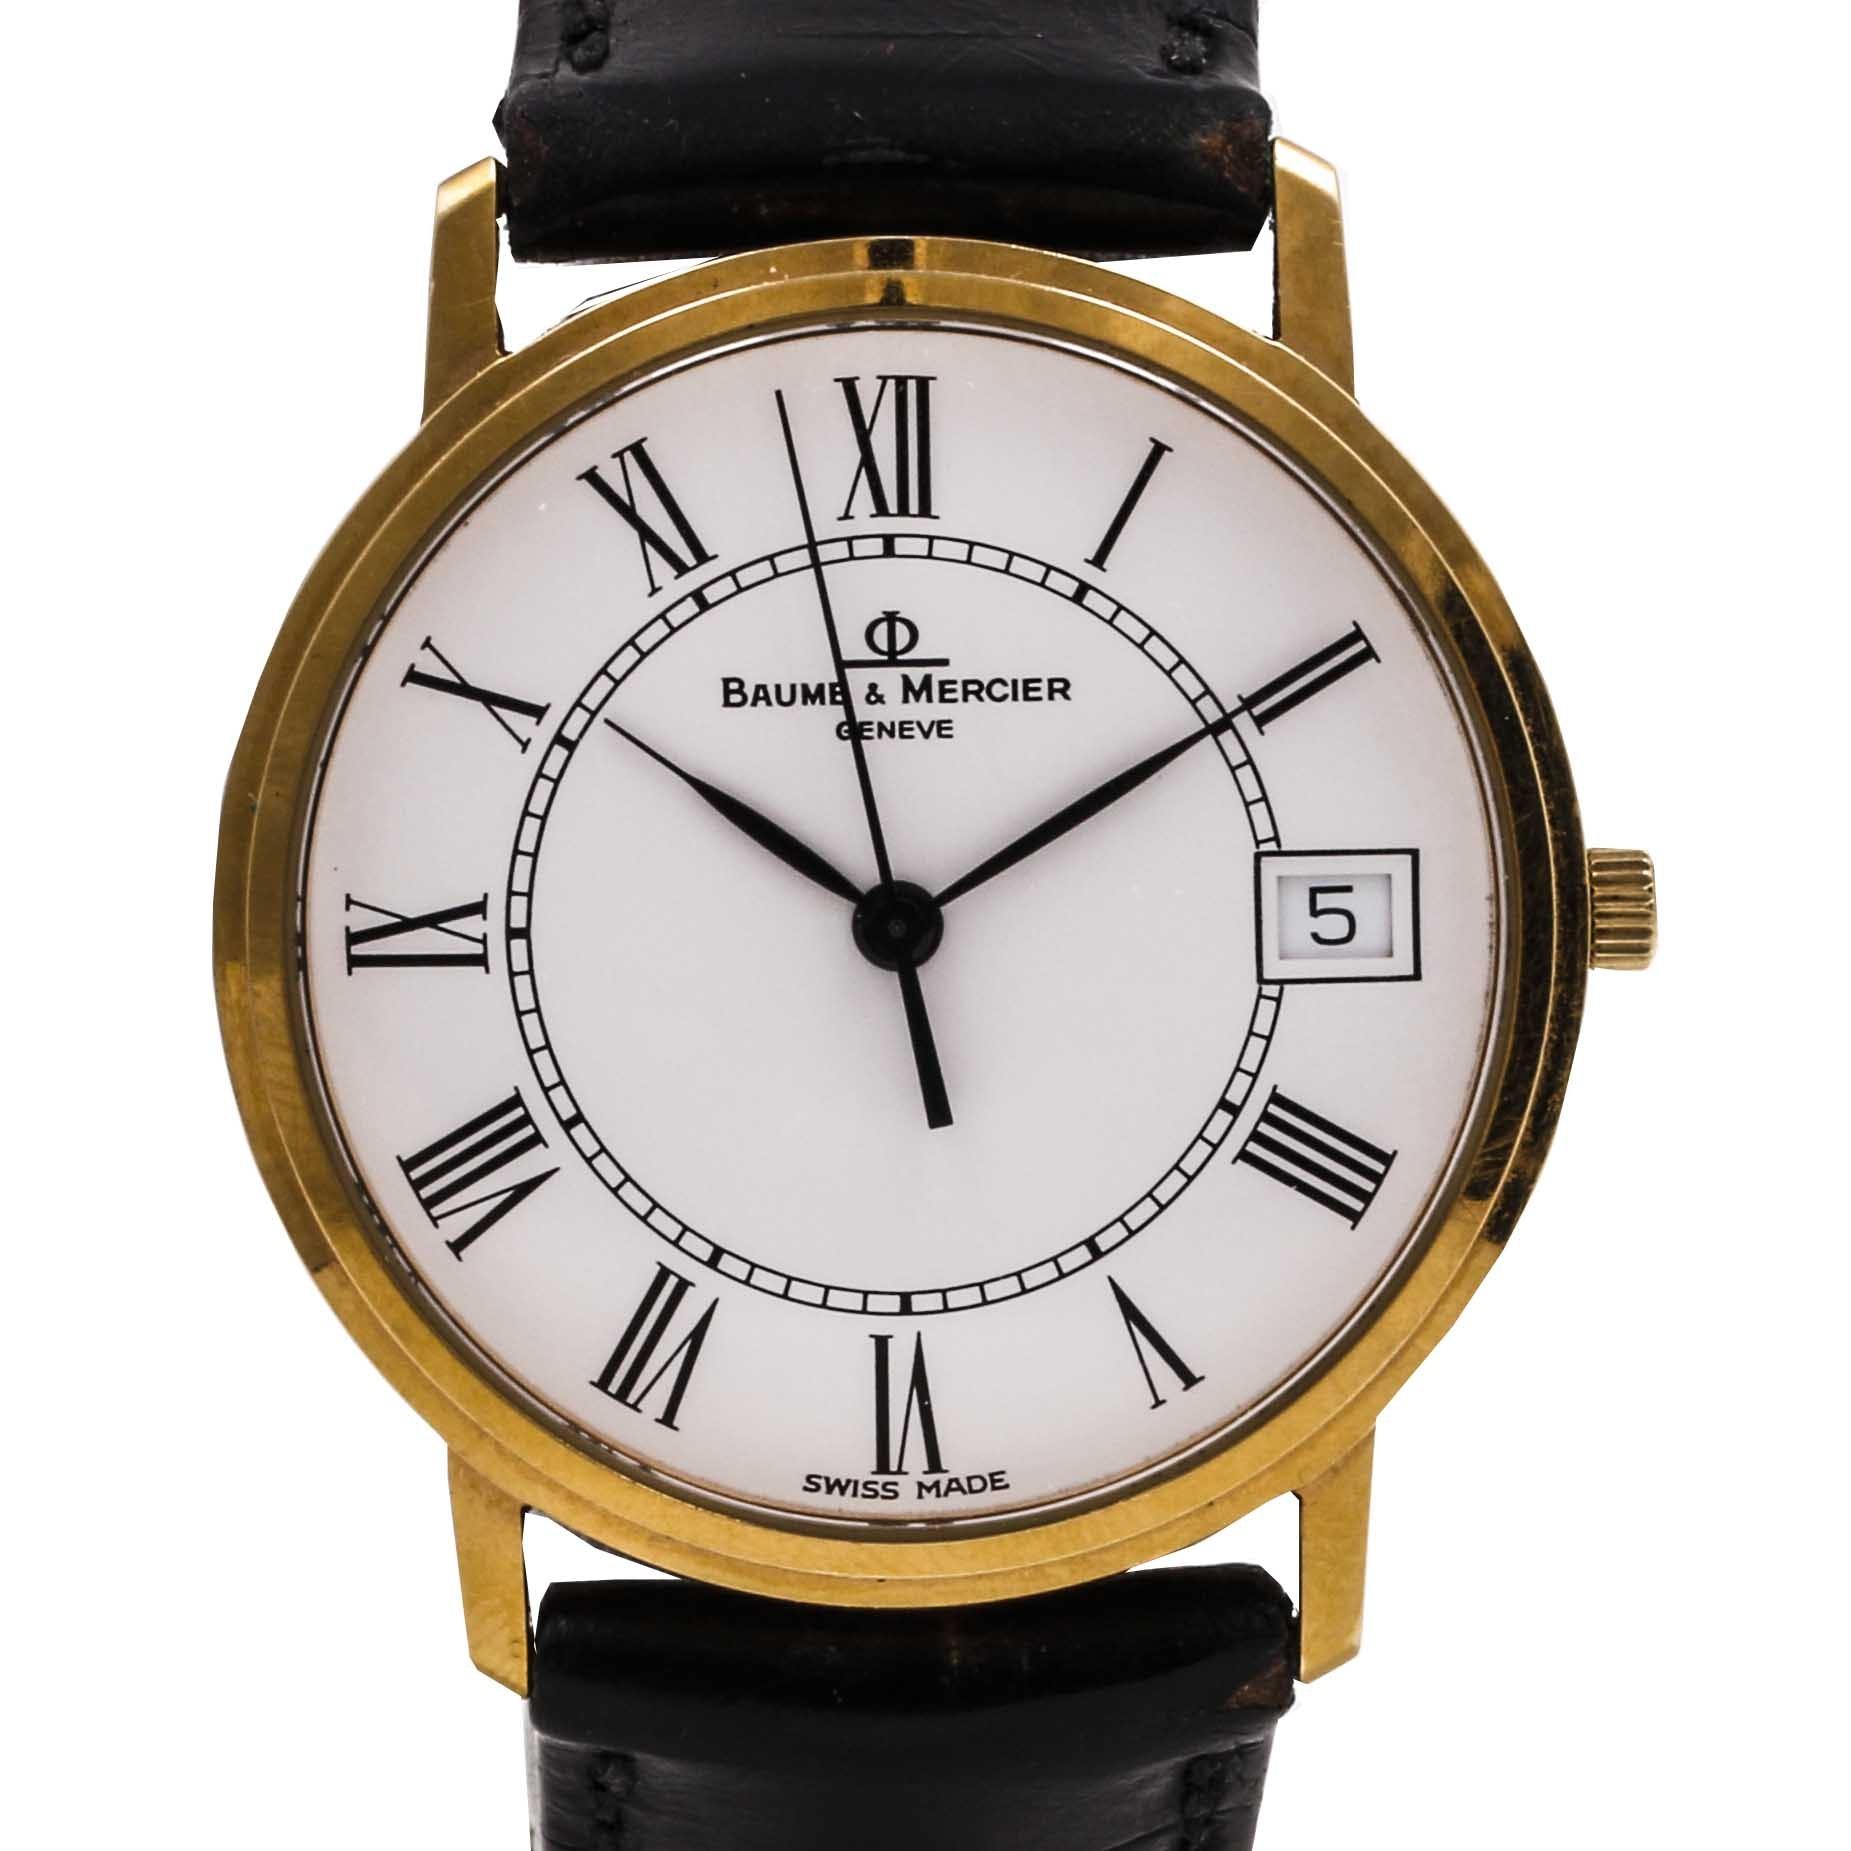 Baume & Mercier Leather Strap Wristwatch